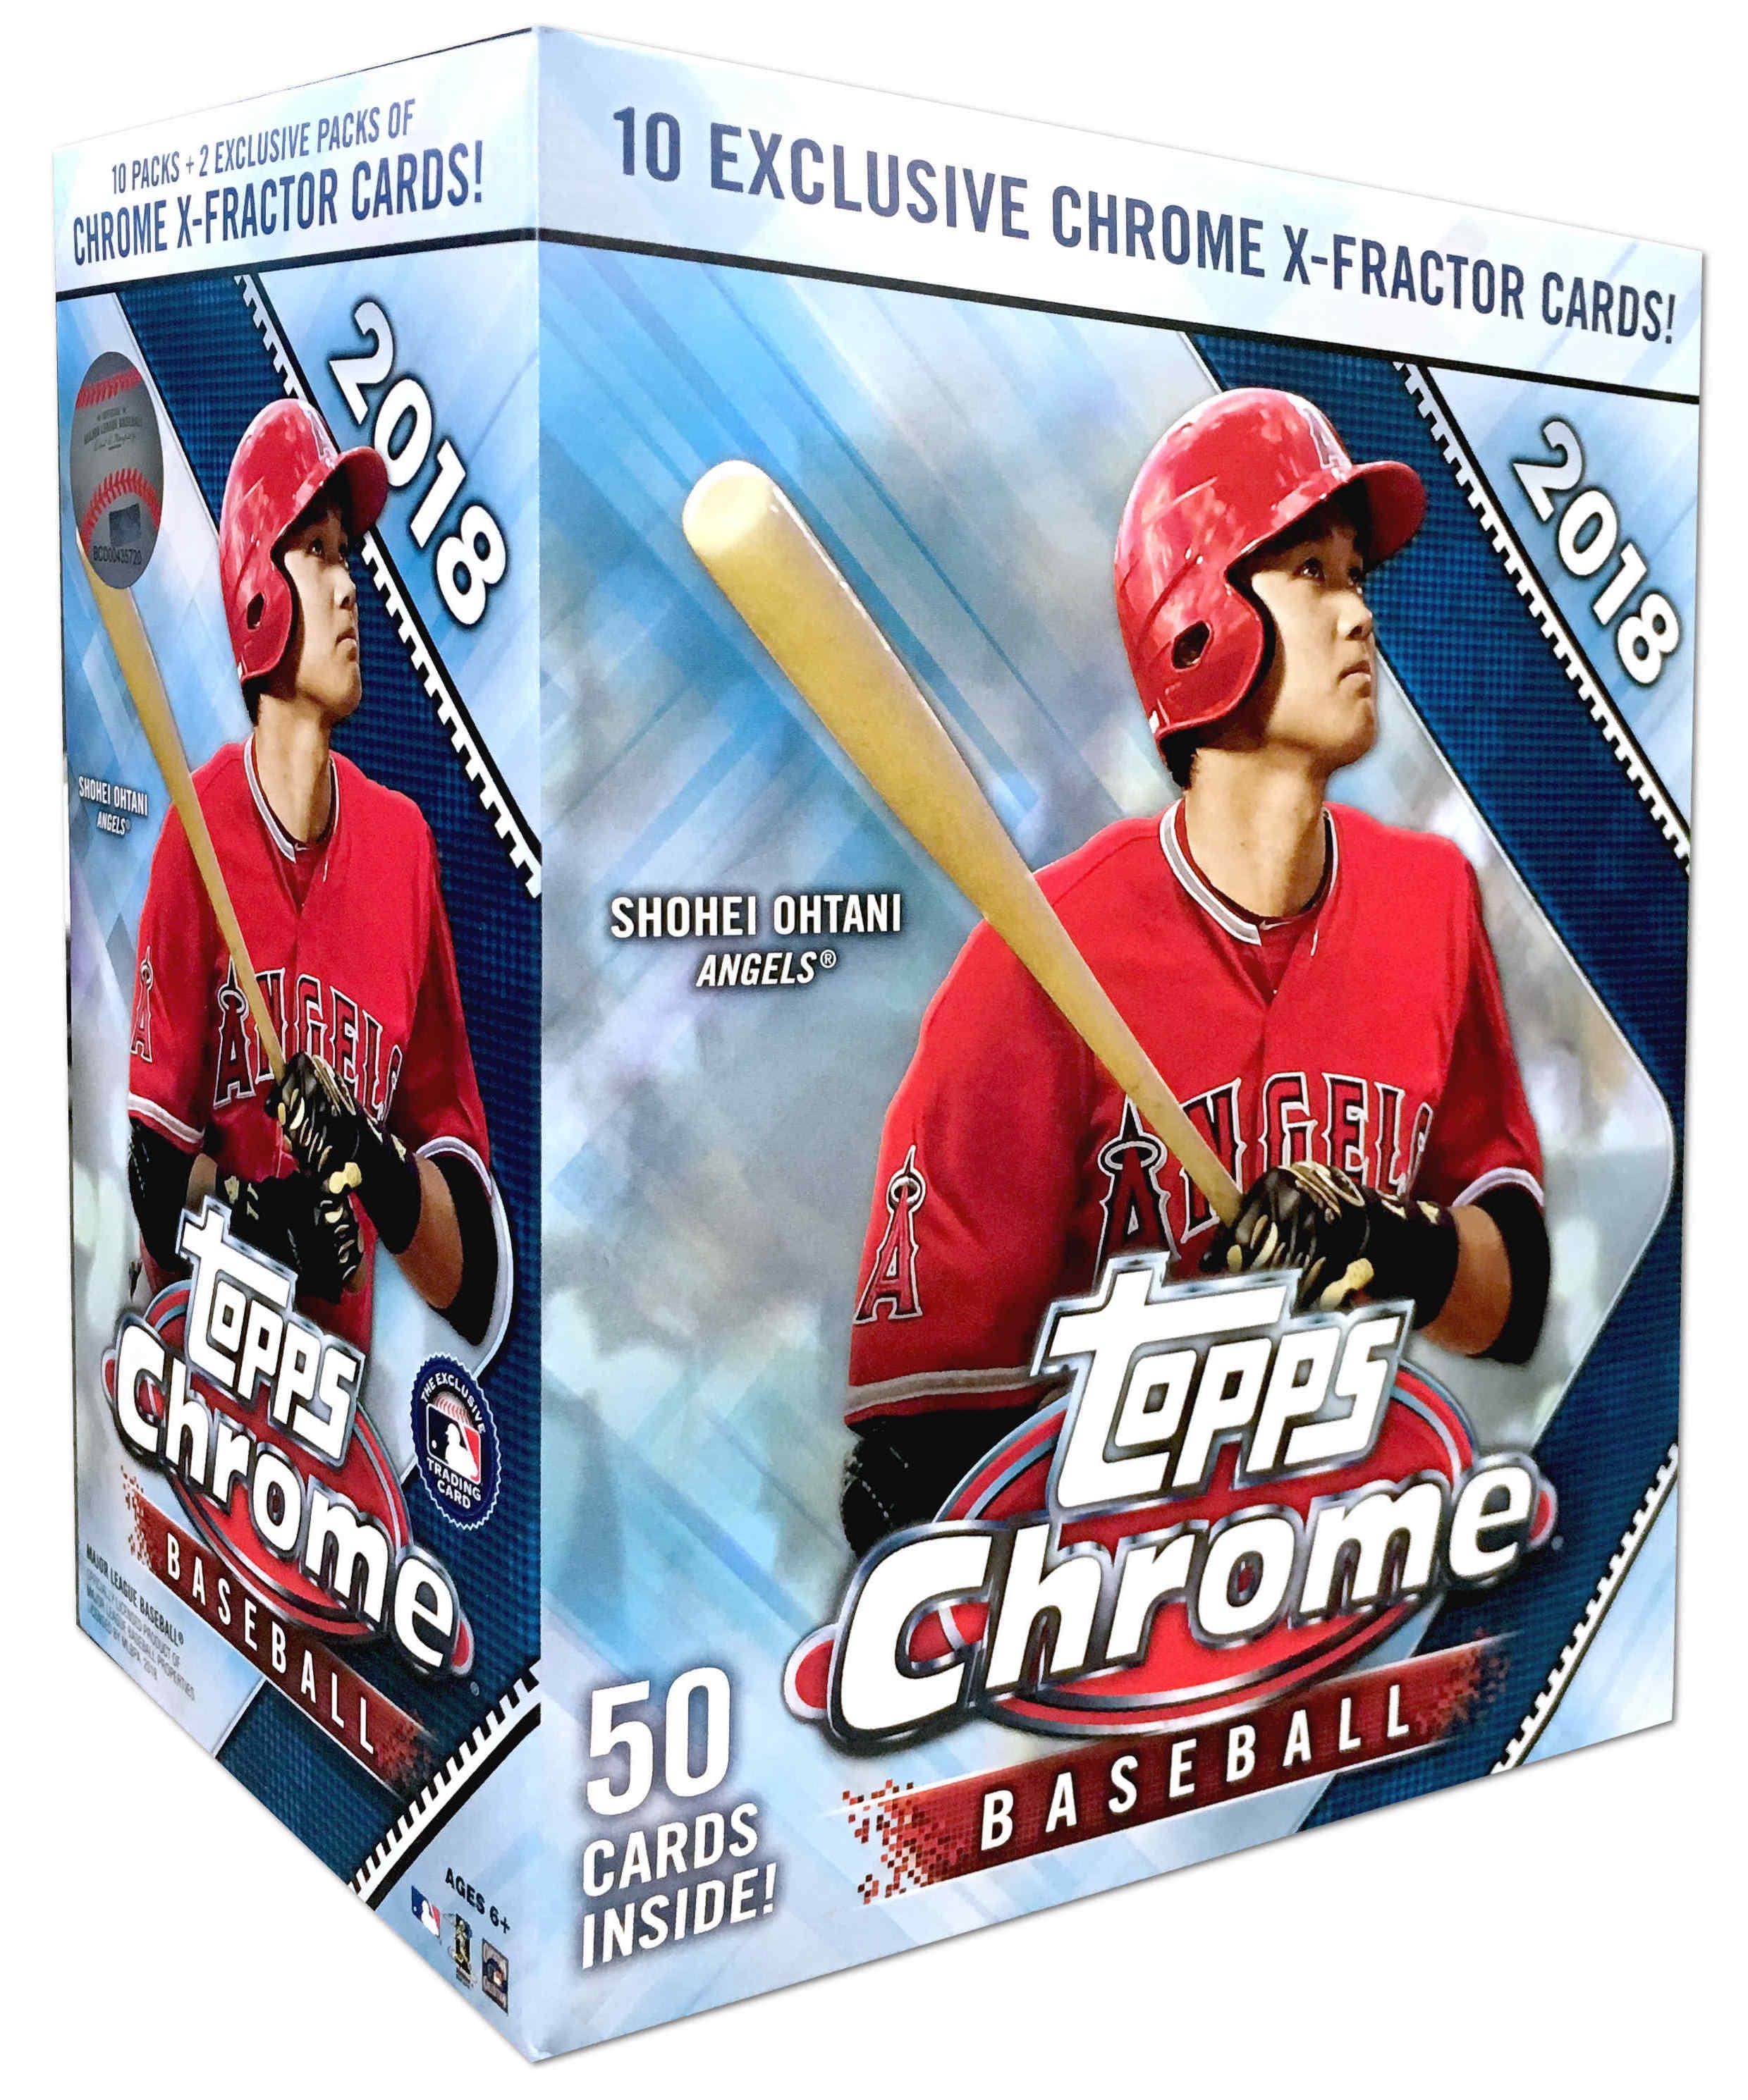 Buzz Break 2018 Topps Chrome Baseball Cards Mega Box Blowout Buzz